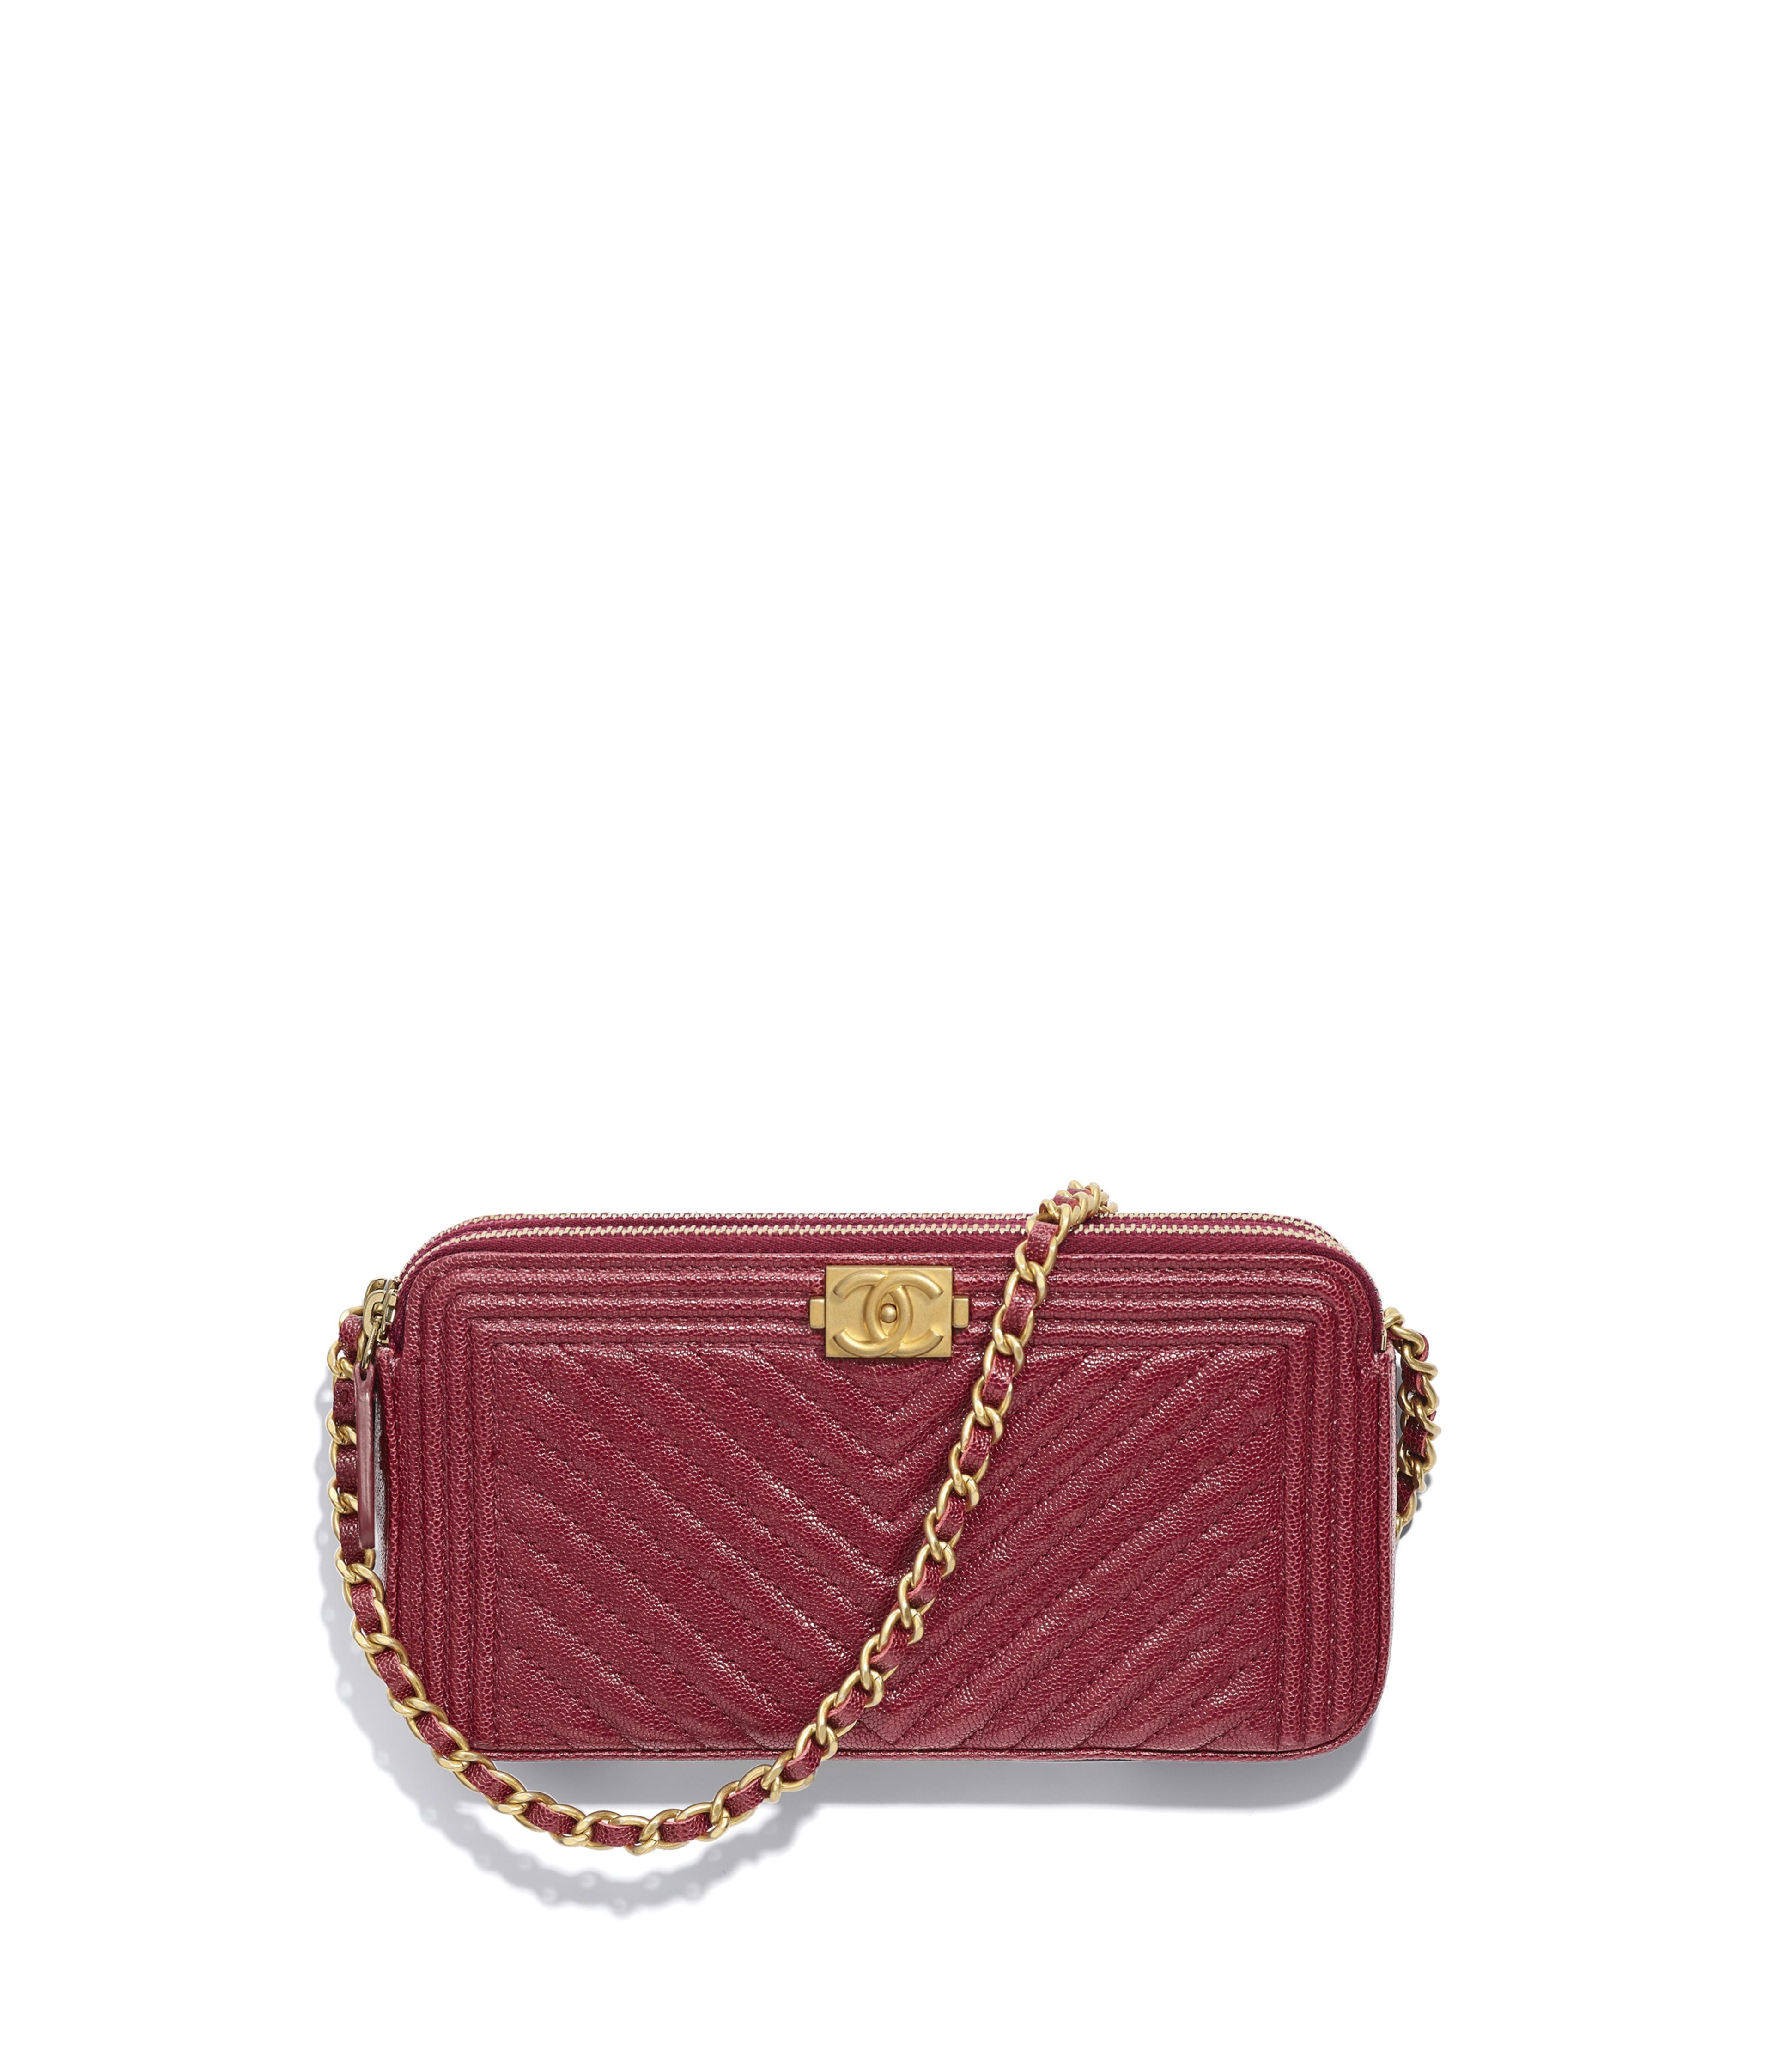 Chanel Replica lego clutch bag fall witter